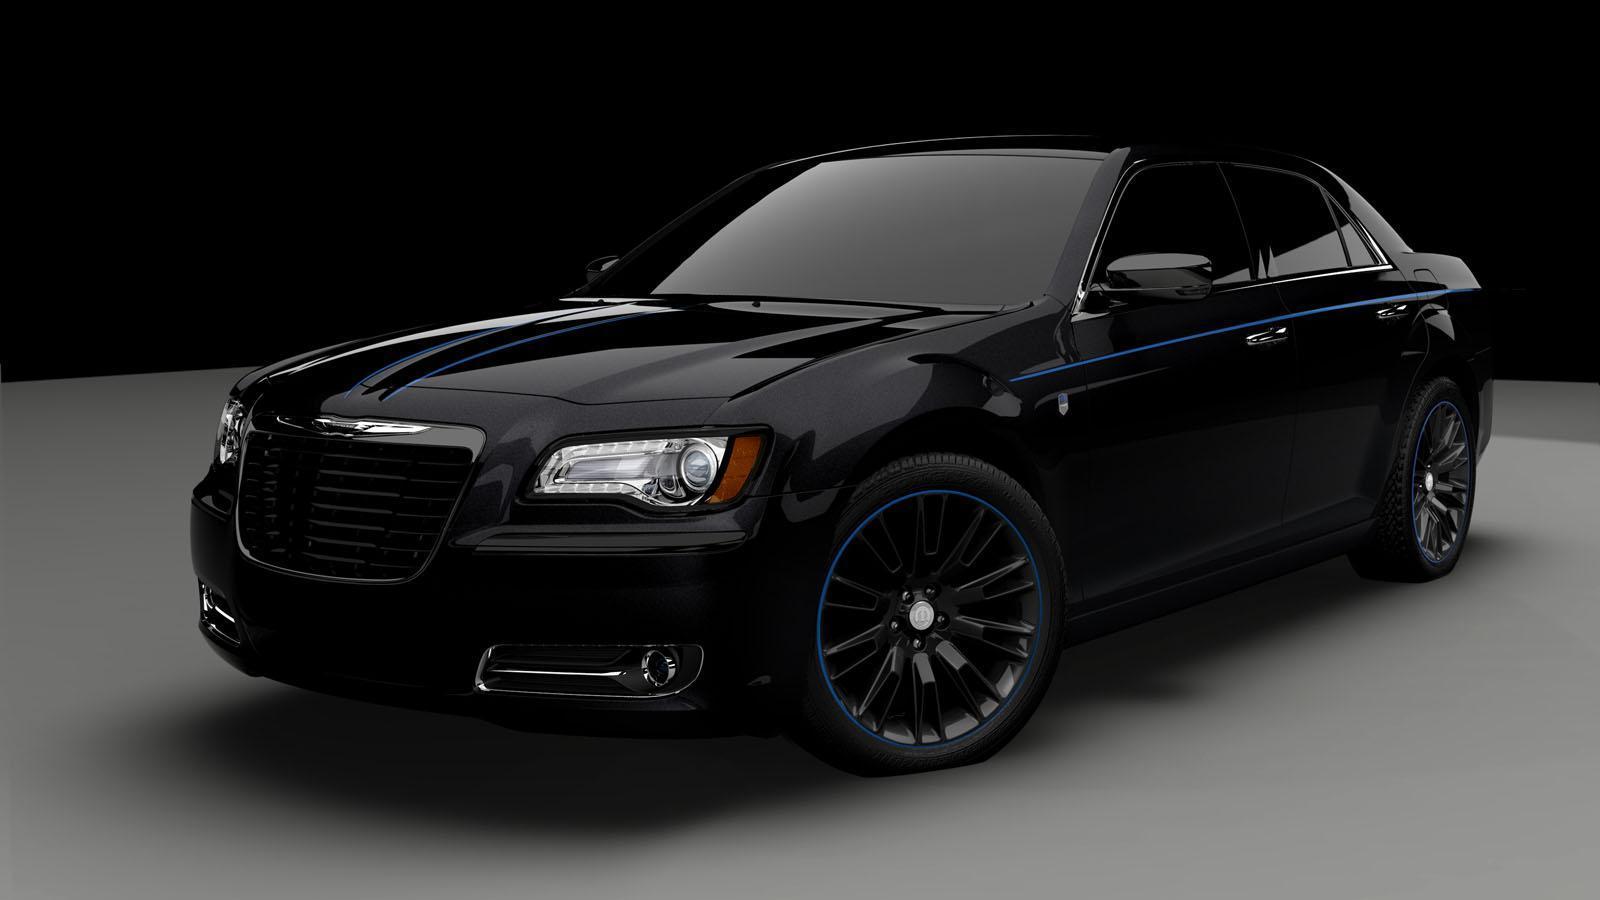 Foto de Chrysler 300 Mopar (1/3)